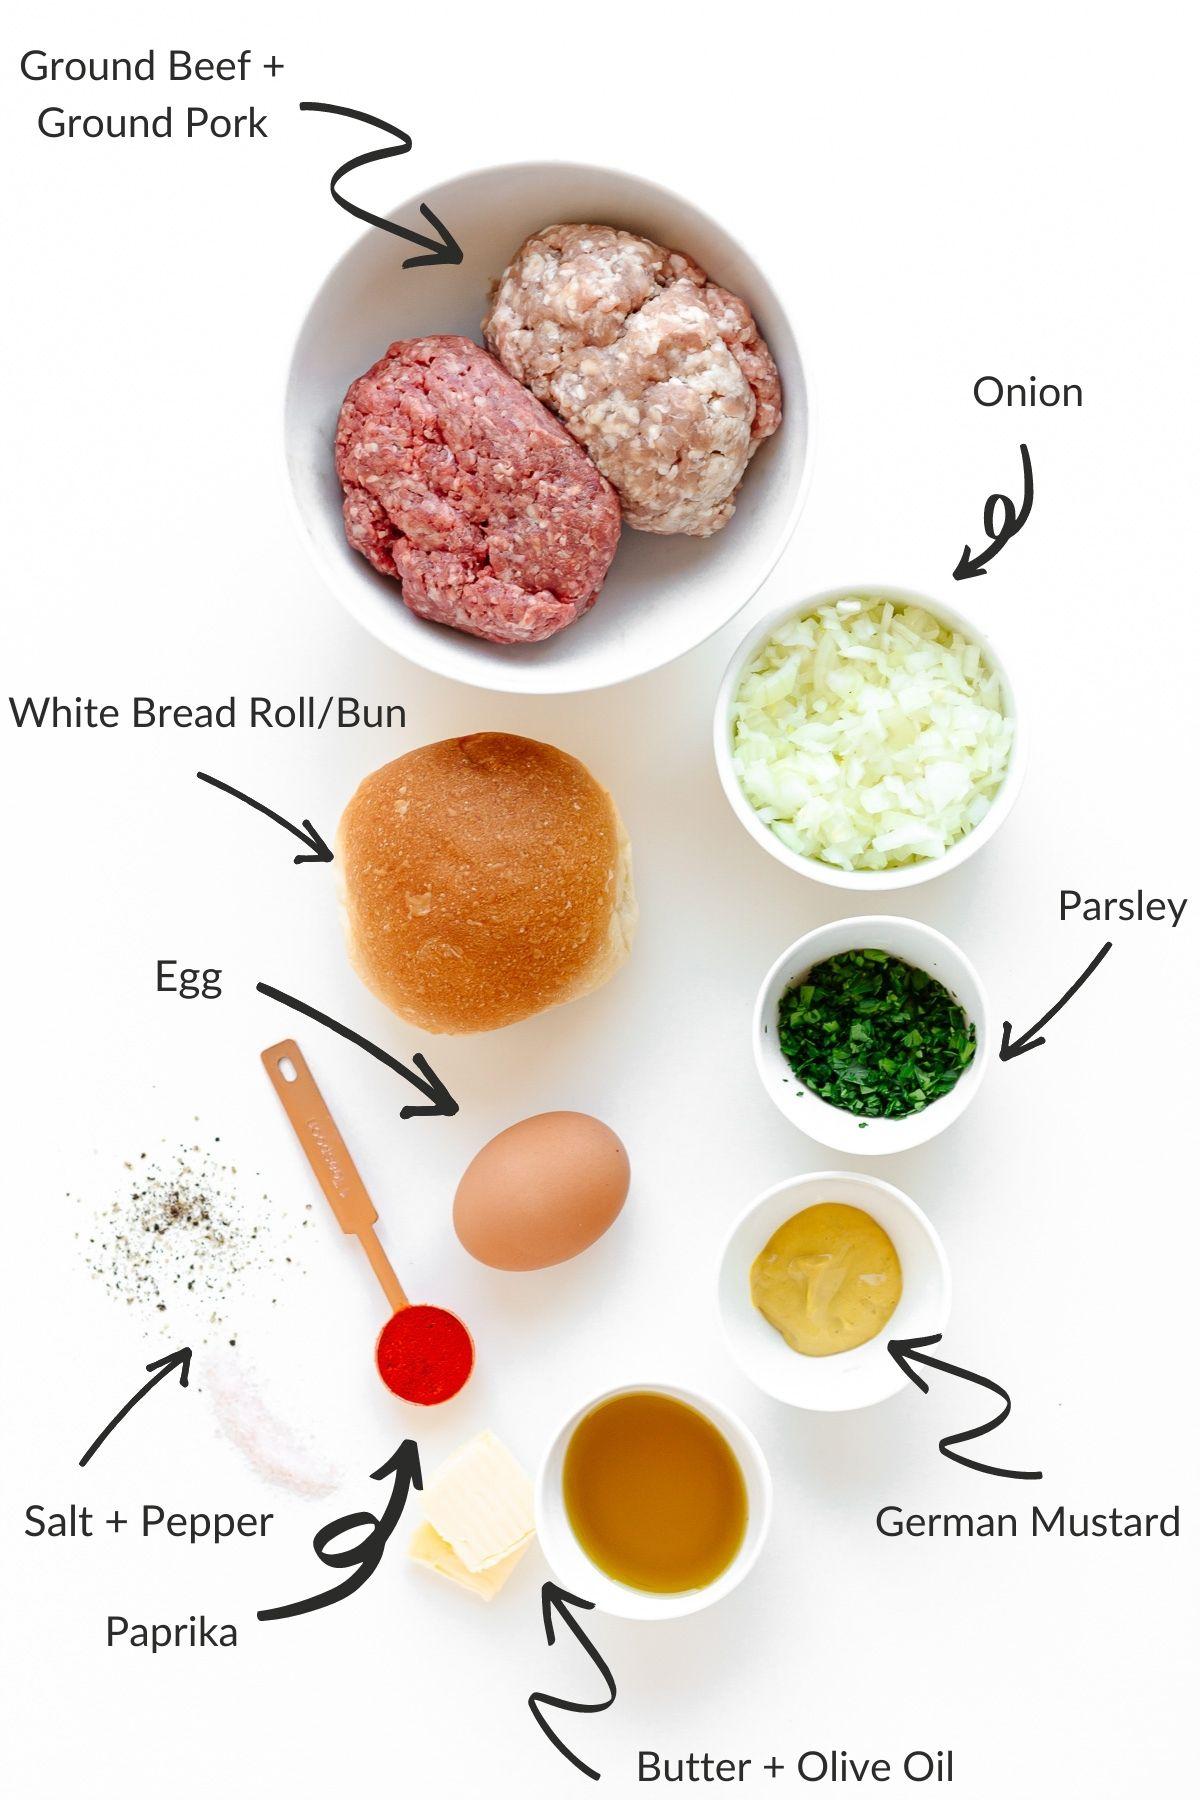 Labelled image of the ingredients needed to make German frikadellen.